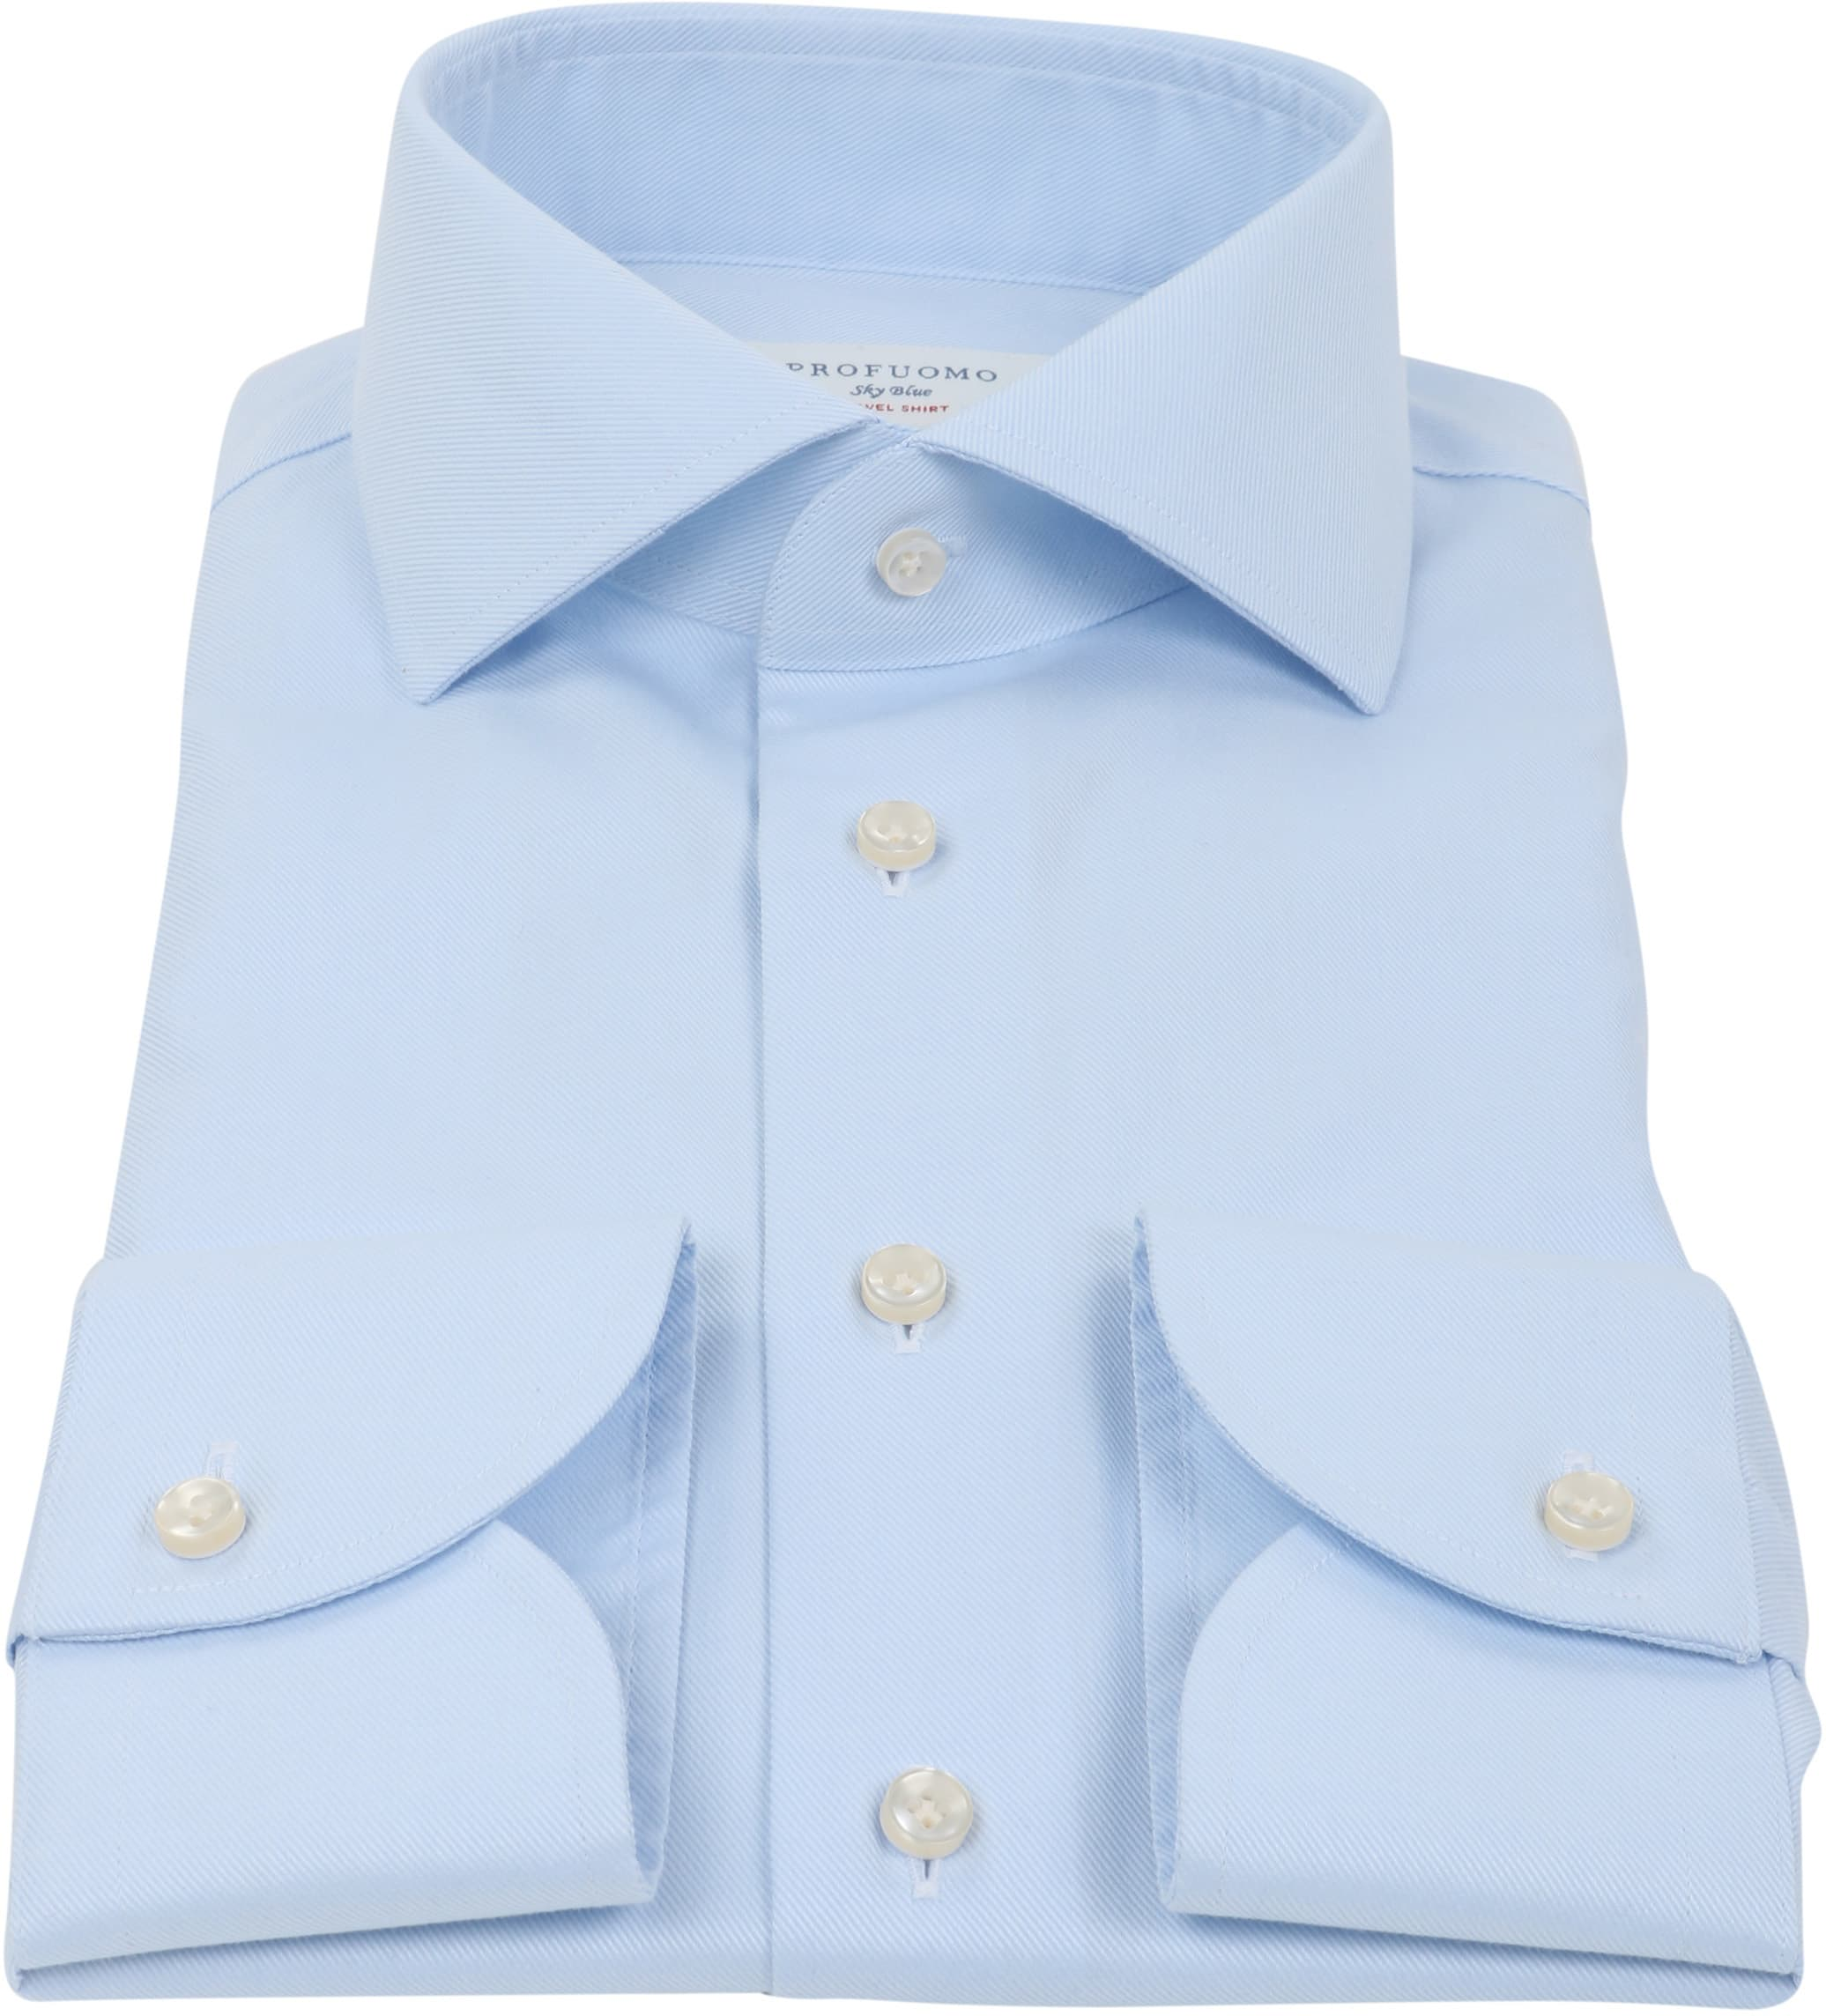 Profuomo Sky Blue Travel Shirt Blau foto 3